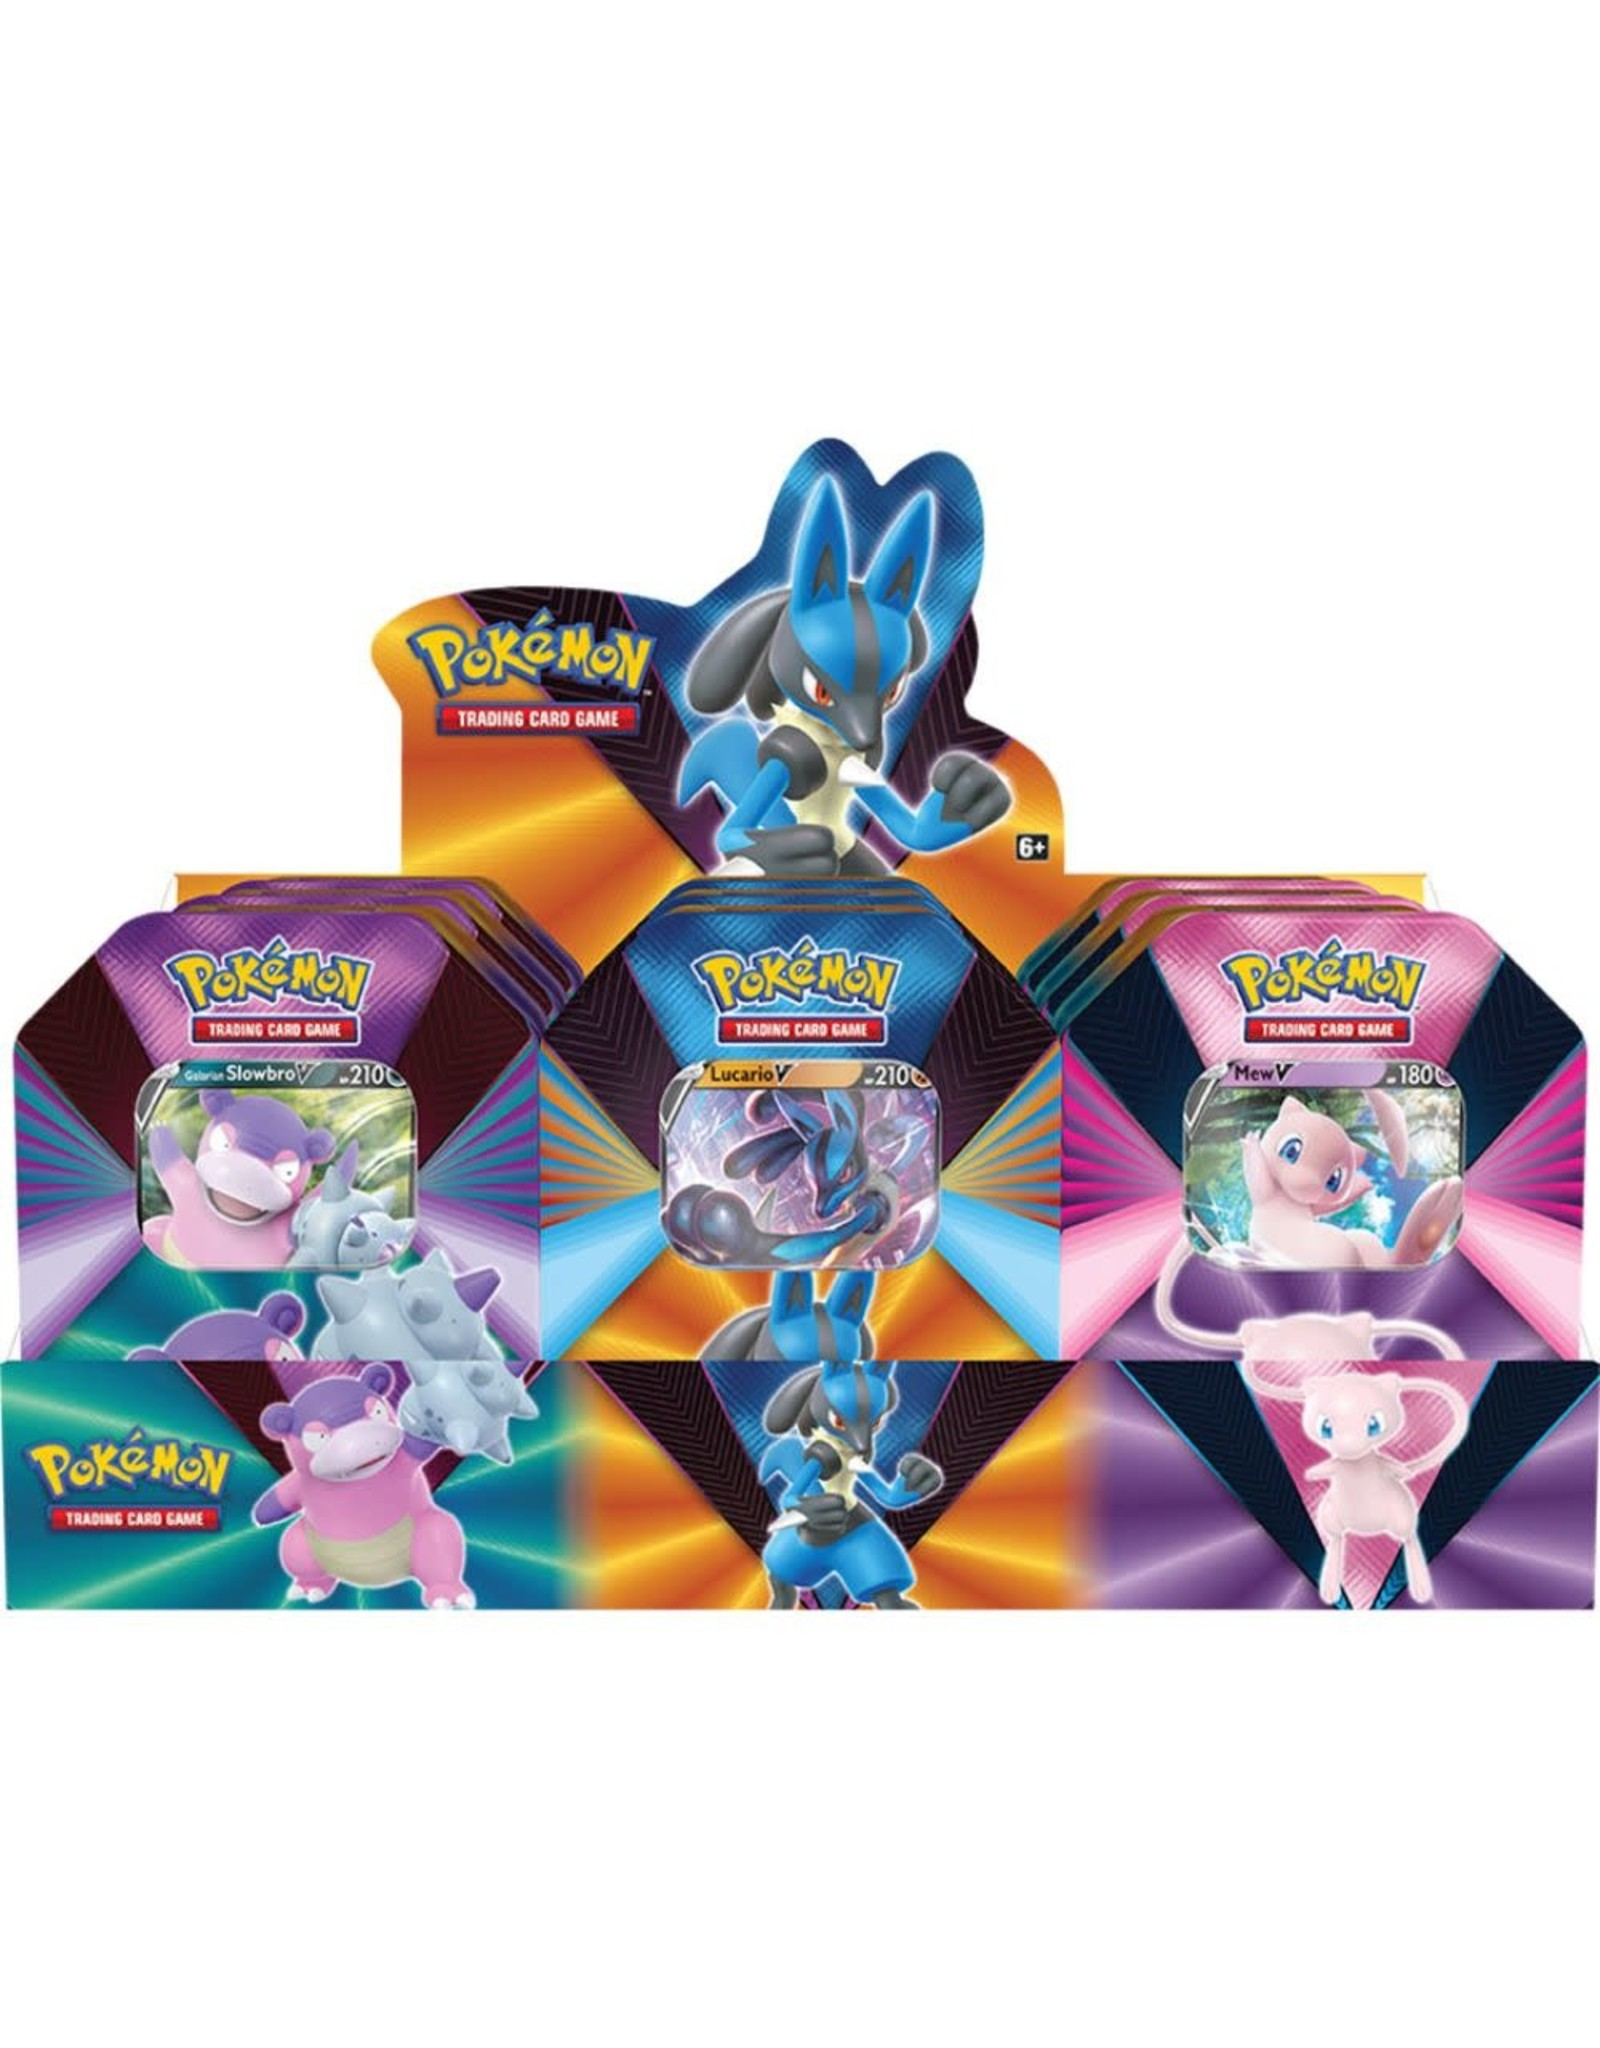 Pokémon TCG: 2021 V Tin